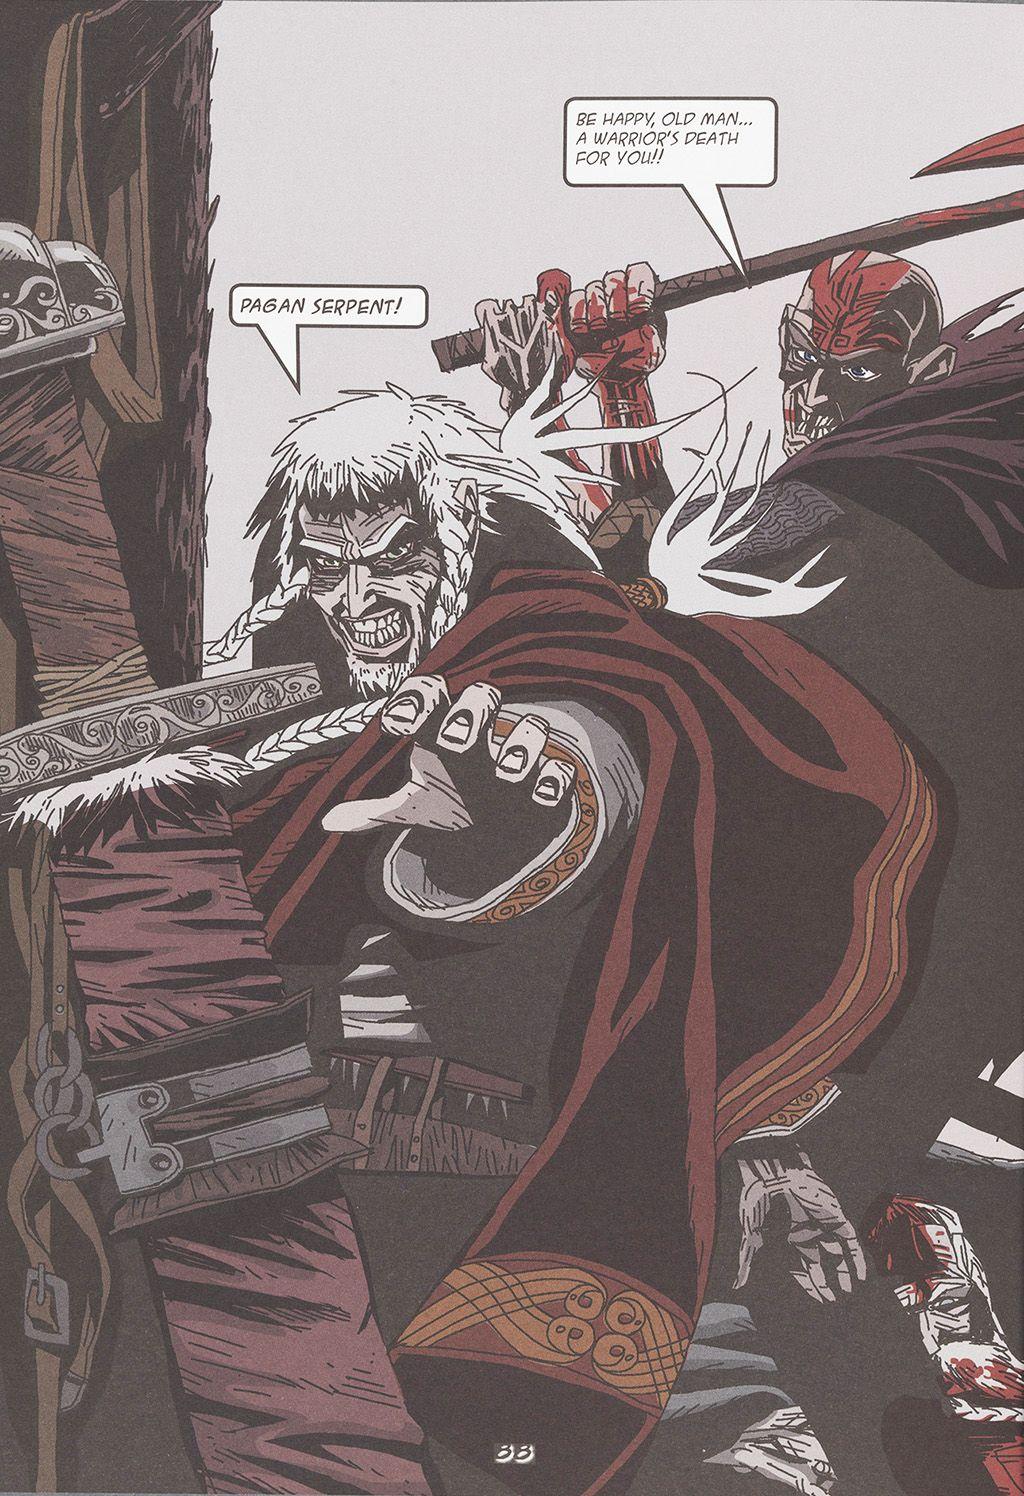 'Emperor of the Irish': Brian Boru and the Battle of Clontarf 1014 | Irish  | Pinterest | Irish, Brian boru and Battle